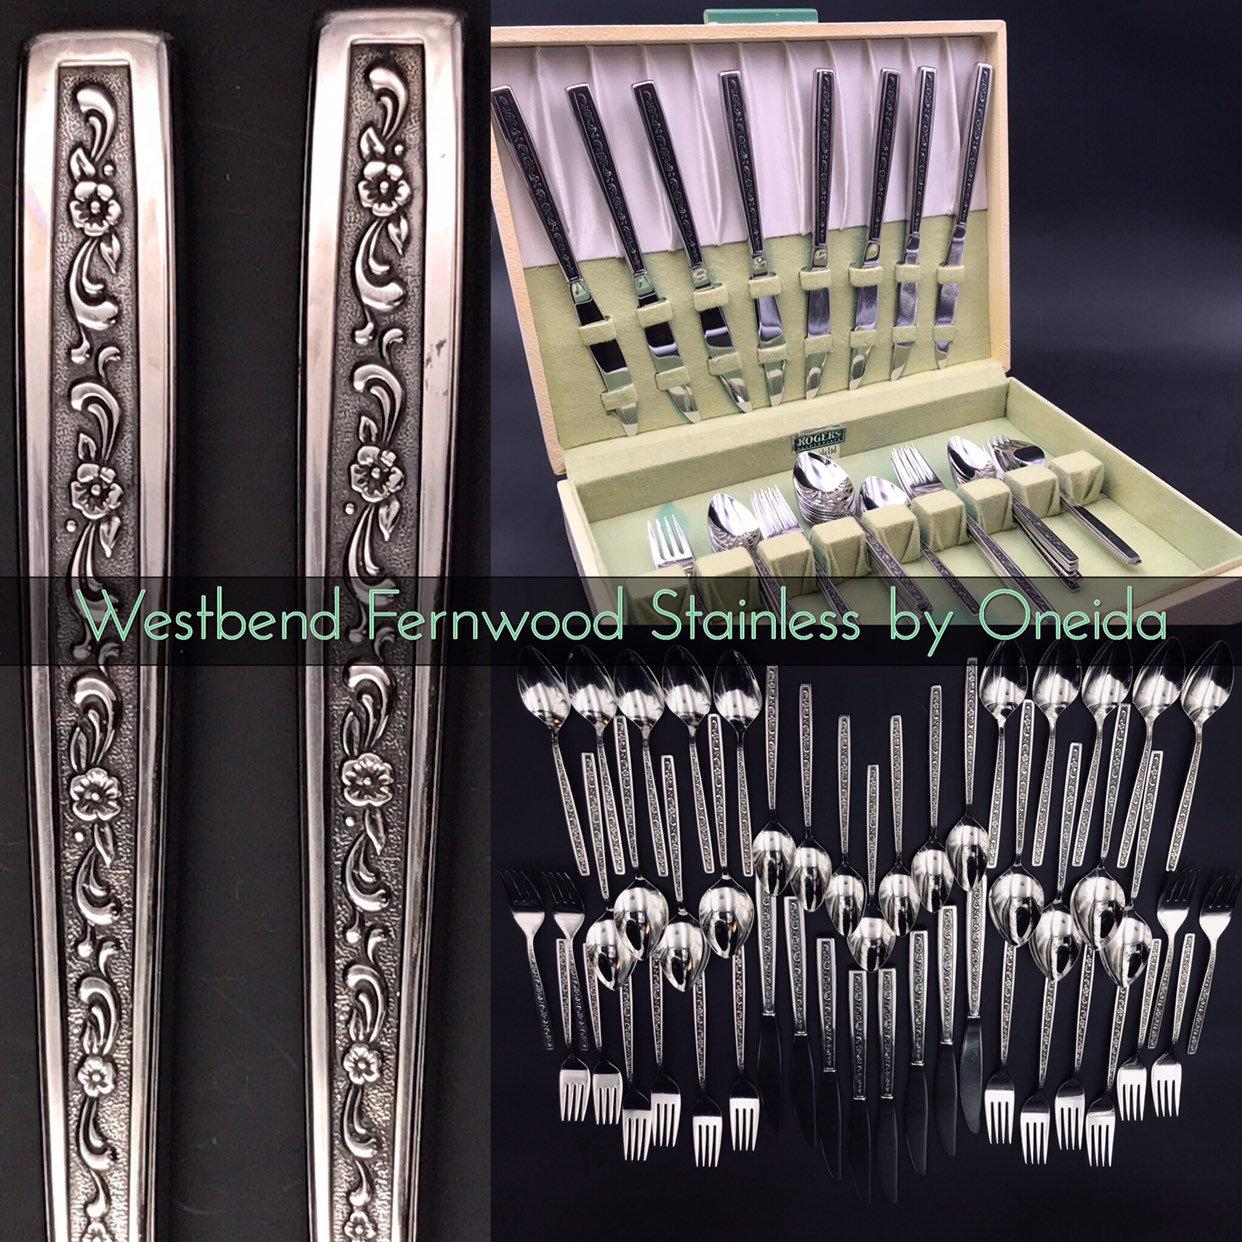 Vintage Oneida Westbend Fernwood Flatware Set Service For 8 Vintage Silverware Chest Glossy Stainless Floral Embossed Silverware